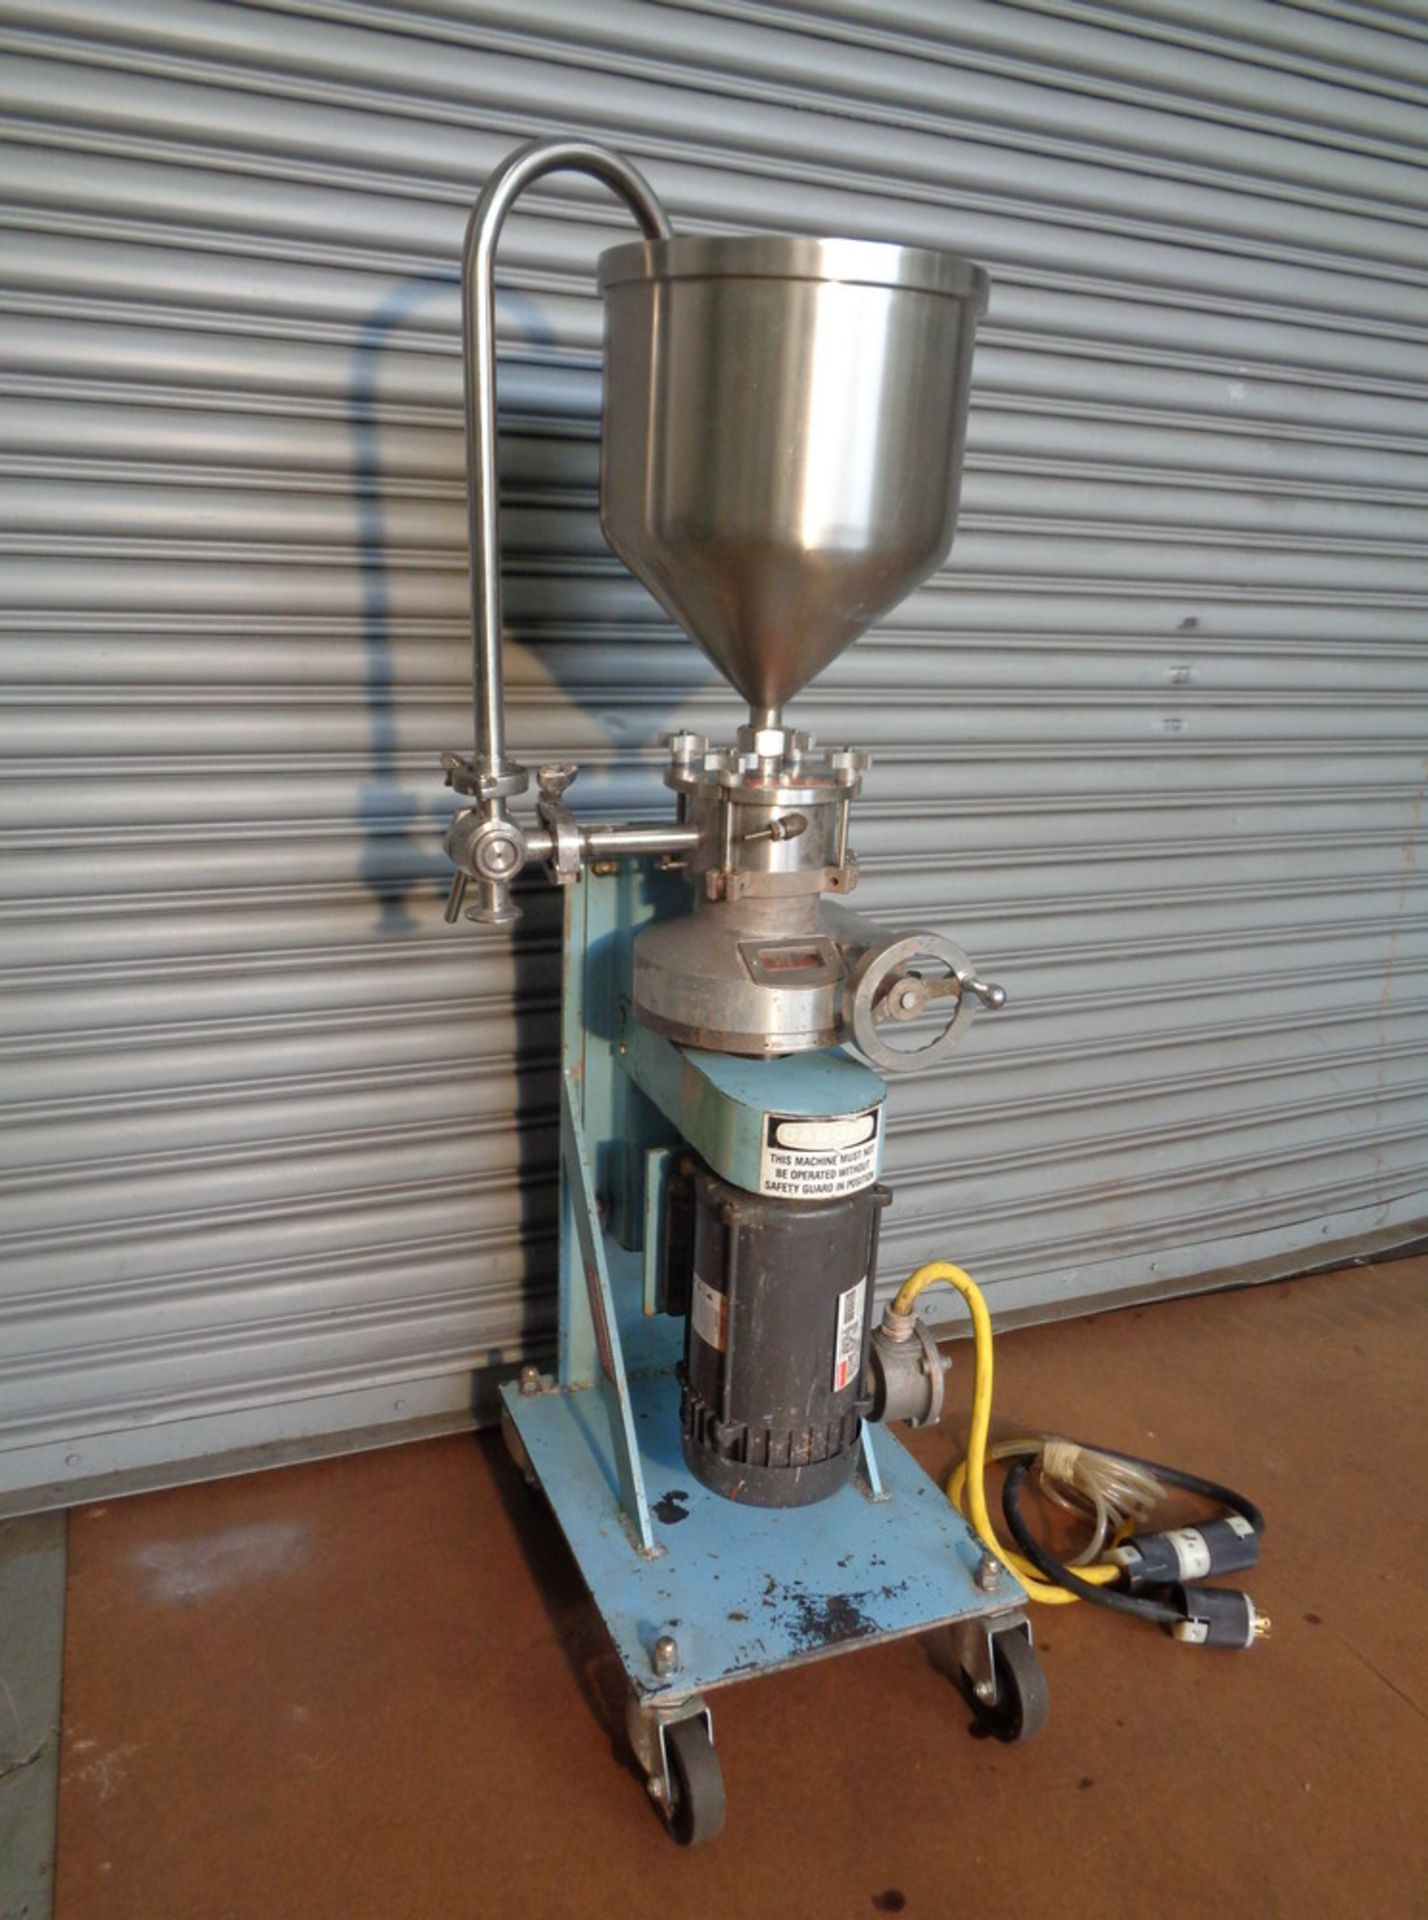 Lot 22 - Greerco 2 HP XP SS Vertical Colloid Mill, Model W250VB, S/N 86-03392596B